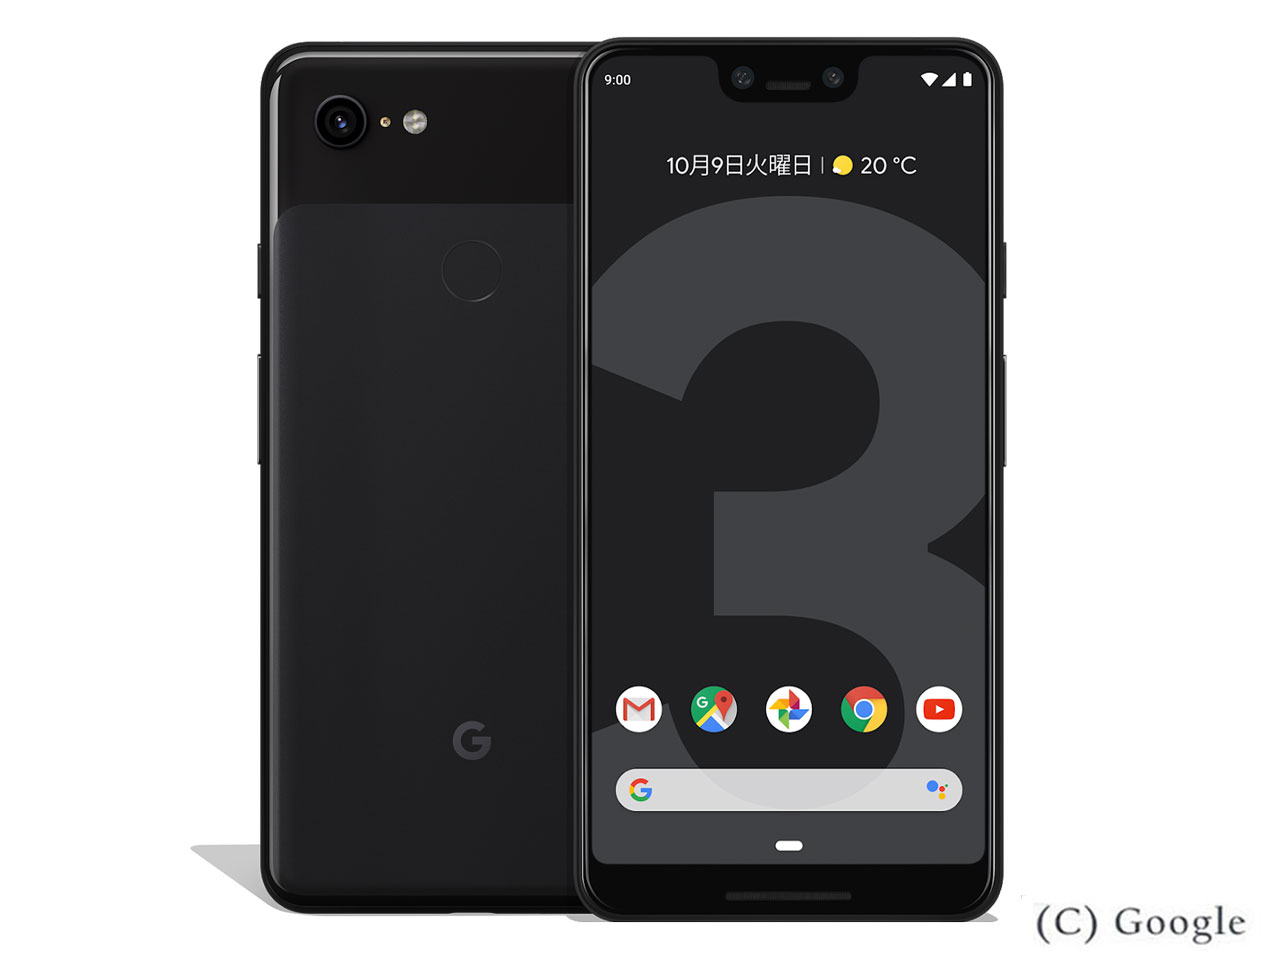 Google Pixel 3 XL 128GB SIMフリー [ジャスト ブラック] の製品画像